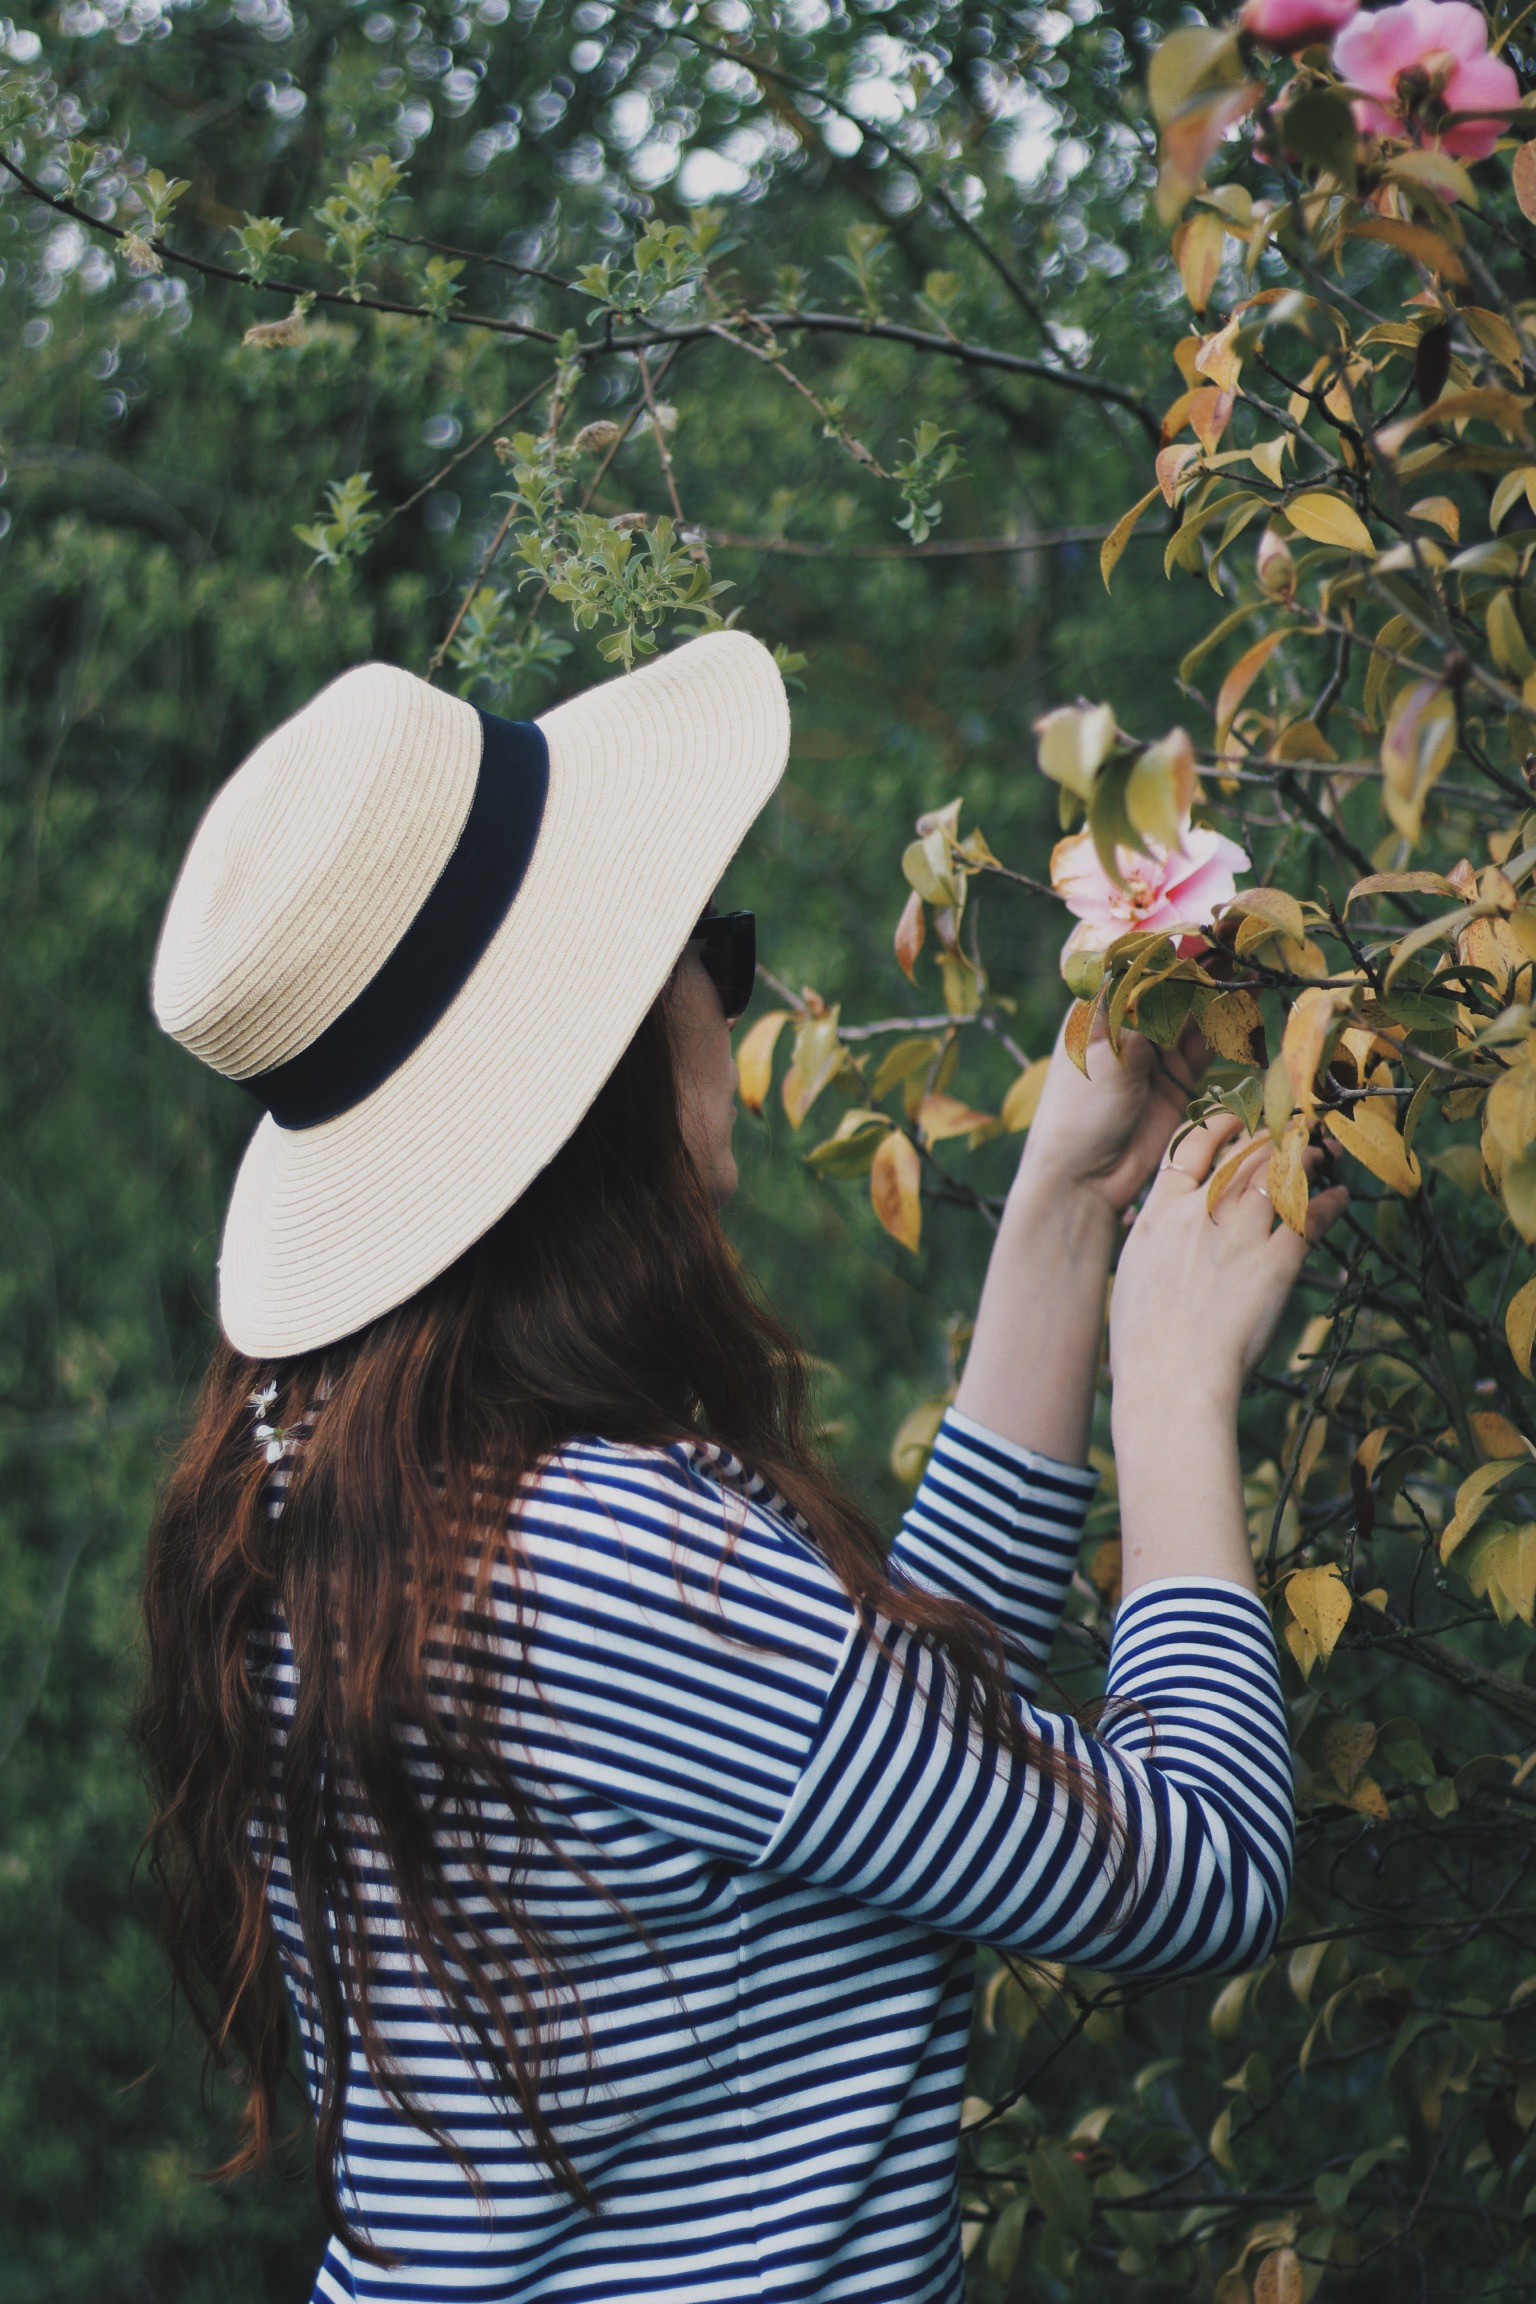 Girl in garden with flowers